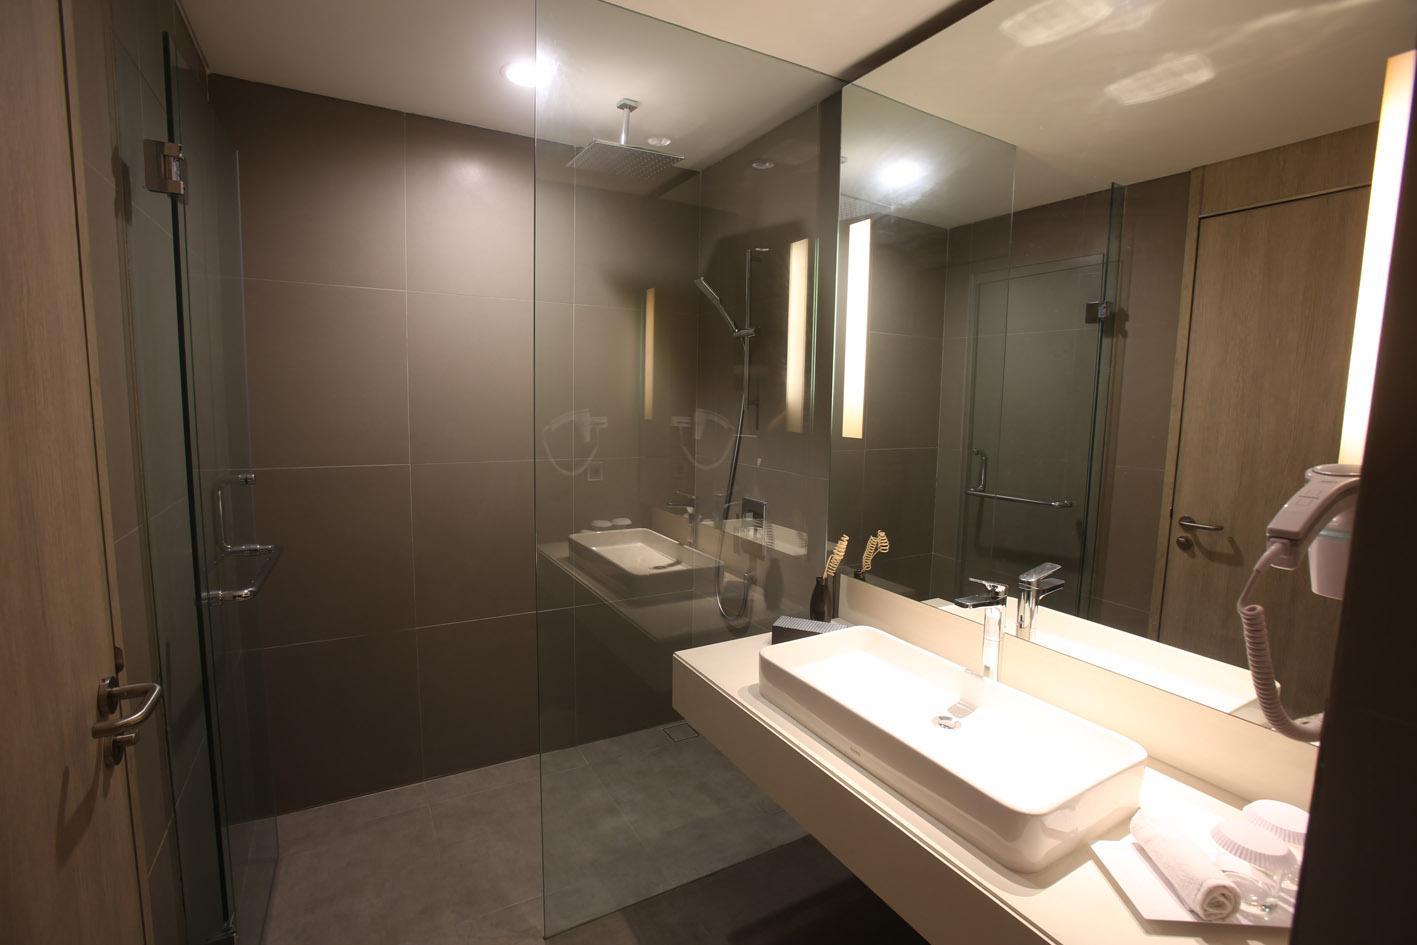 Tangram Hotel Pekanbaru, Riau